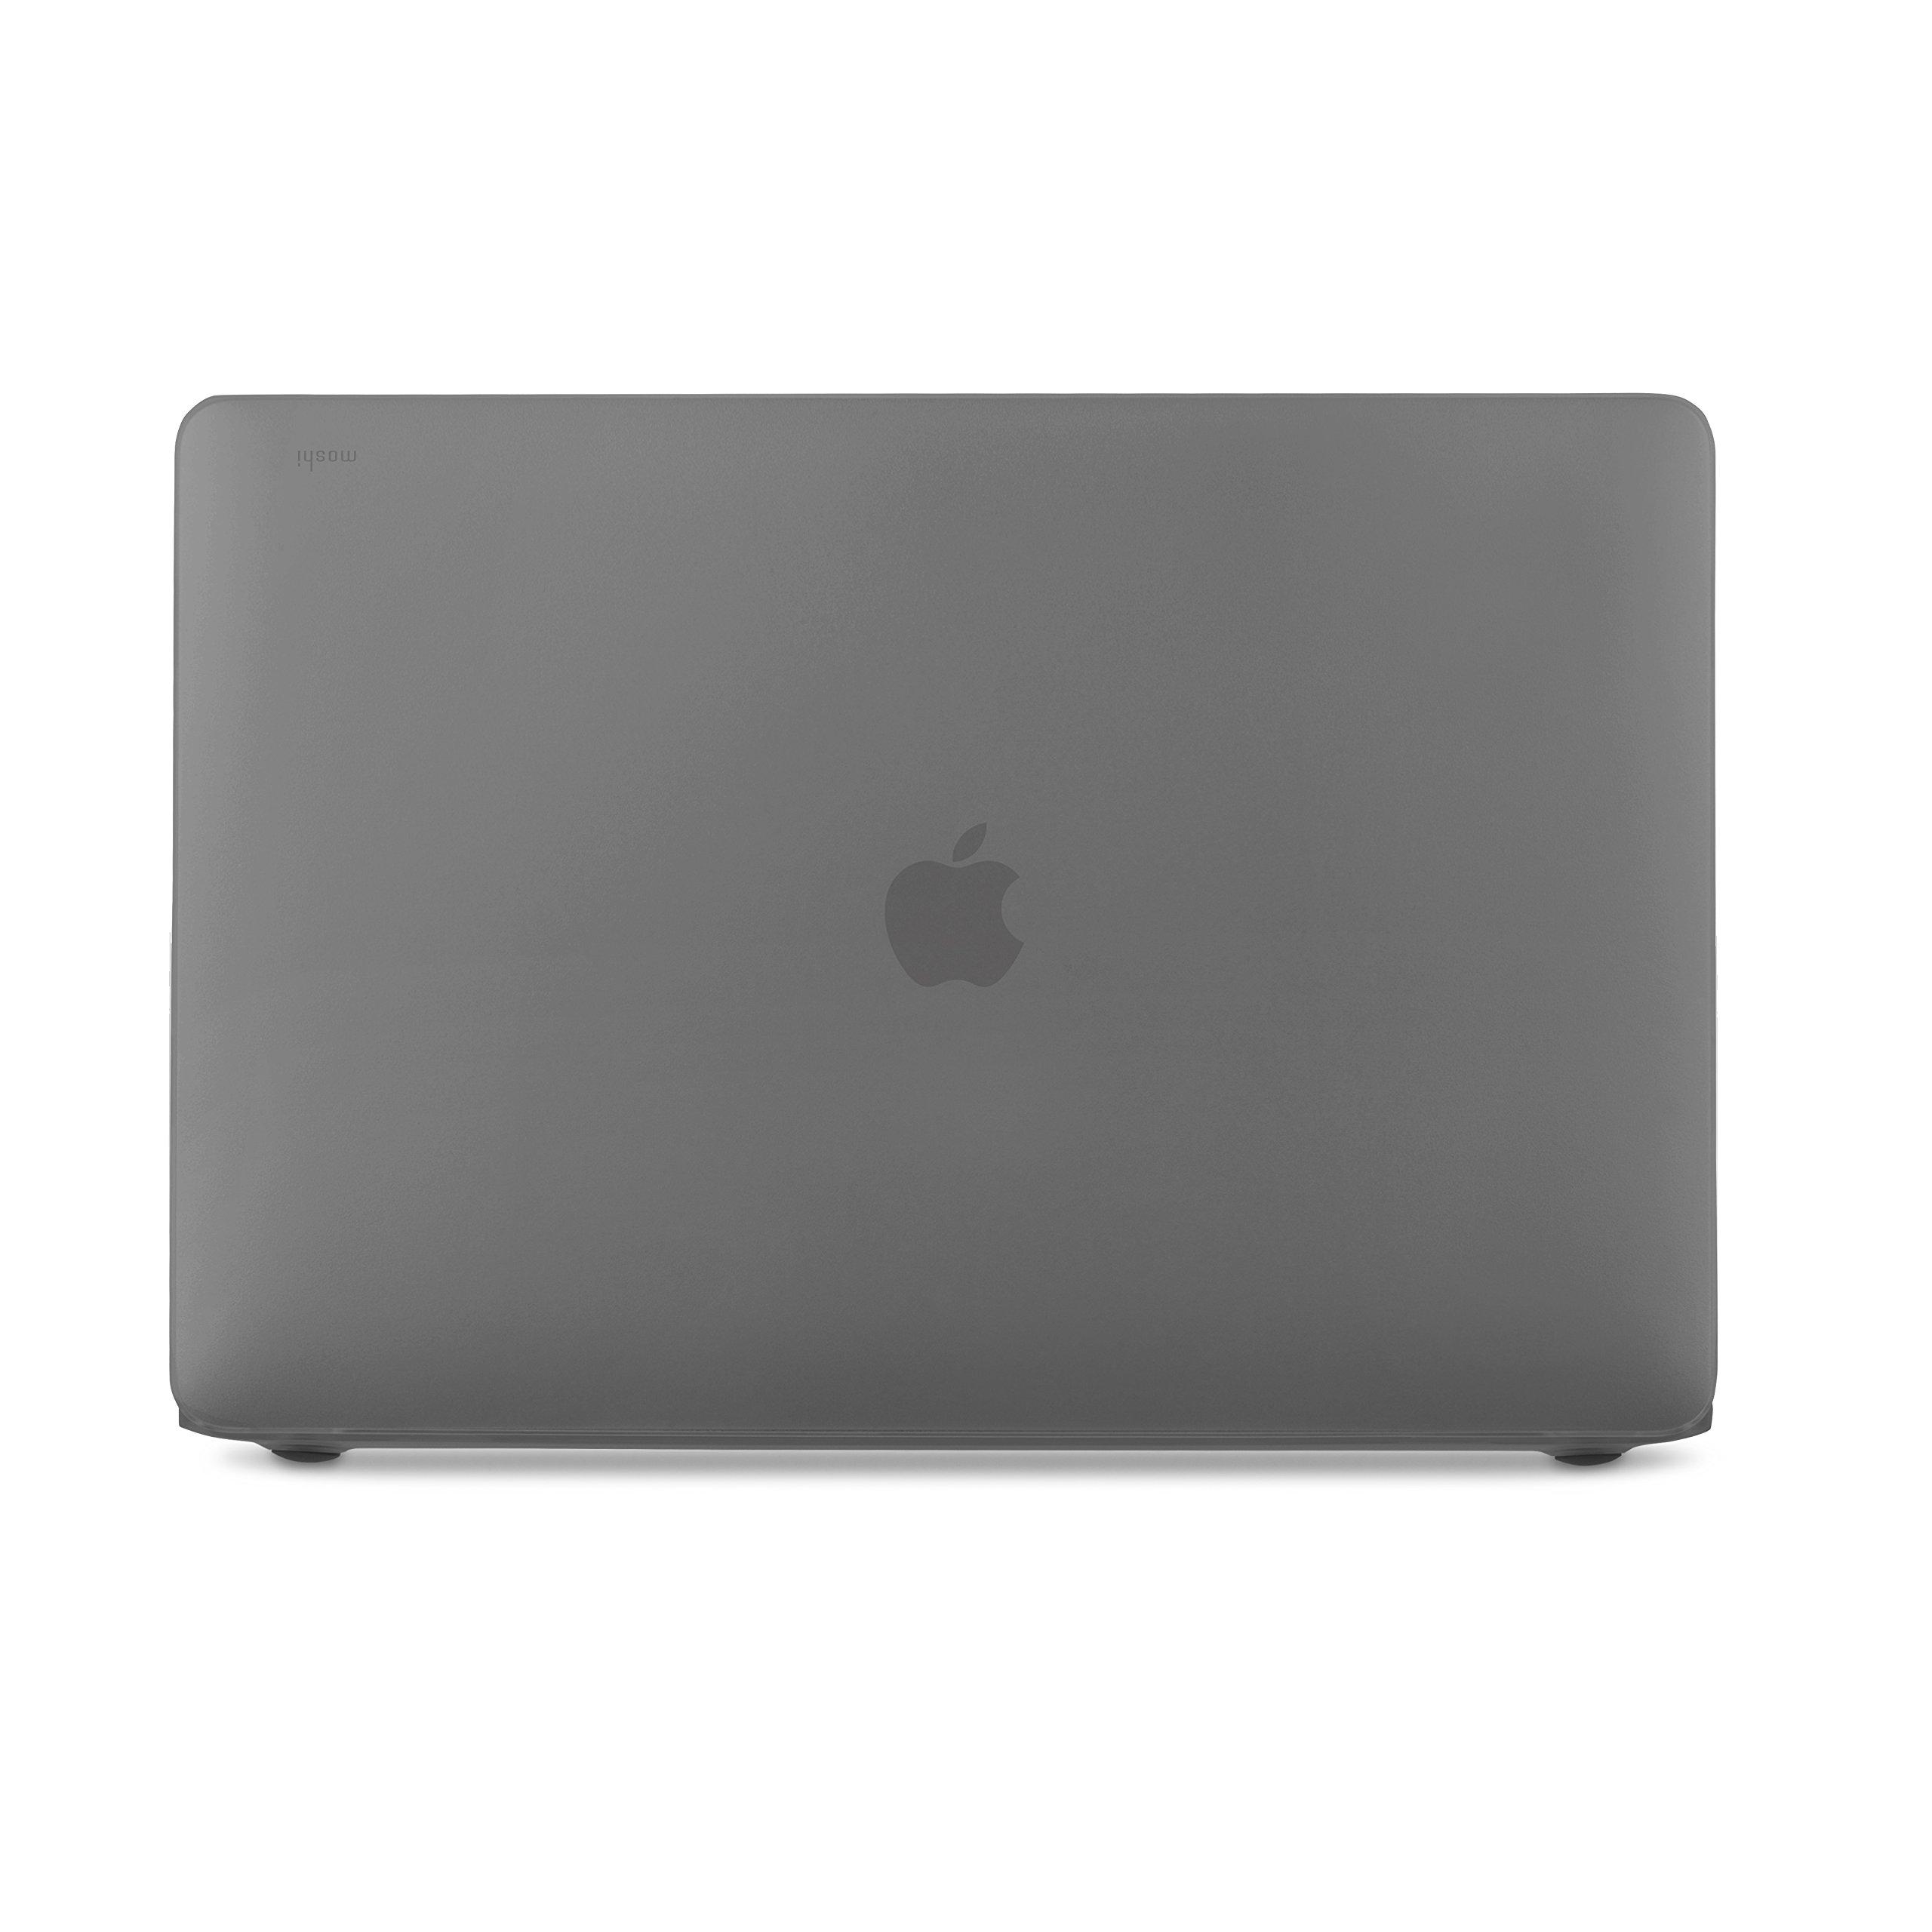 Moshi 99MO071006 iGlaze Hard Case for 2018 New MacBook Pro Retina 15'' & Thunderbolt 3 with Touch Bar, Stealth Black by Moshi (Image #3)